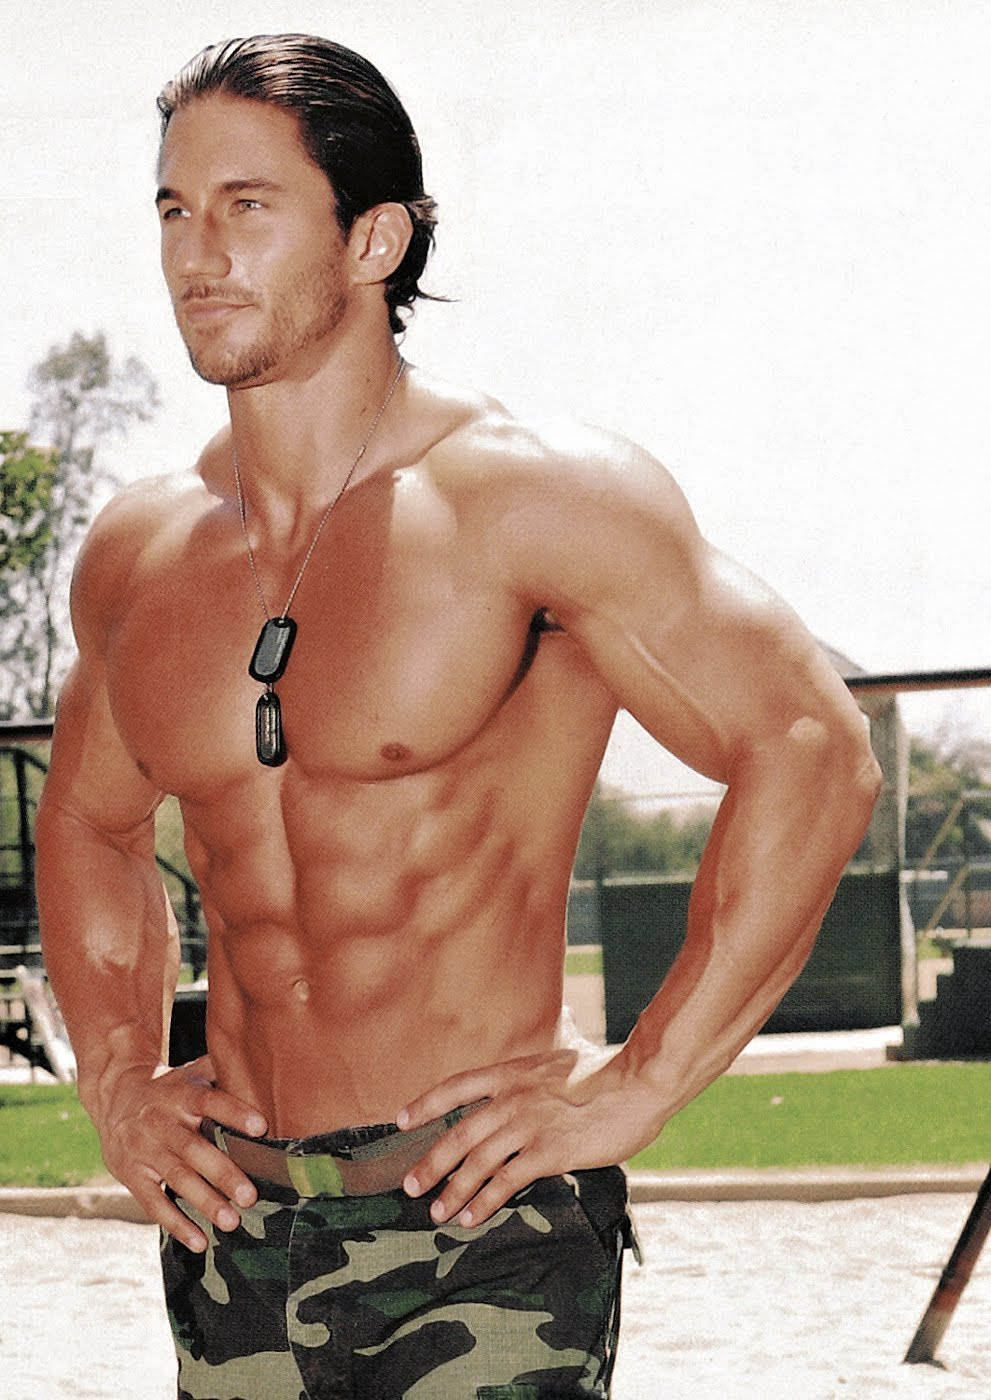 Alexis_Superfans Shirtless Male Celebs: Jeremy Allen